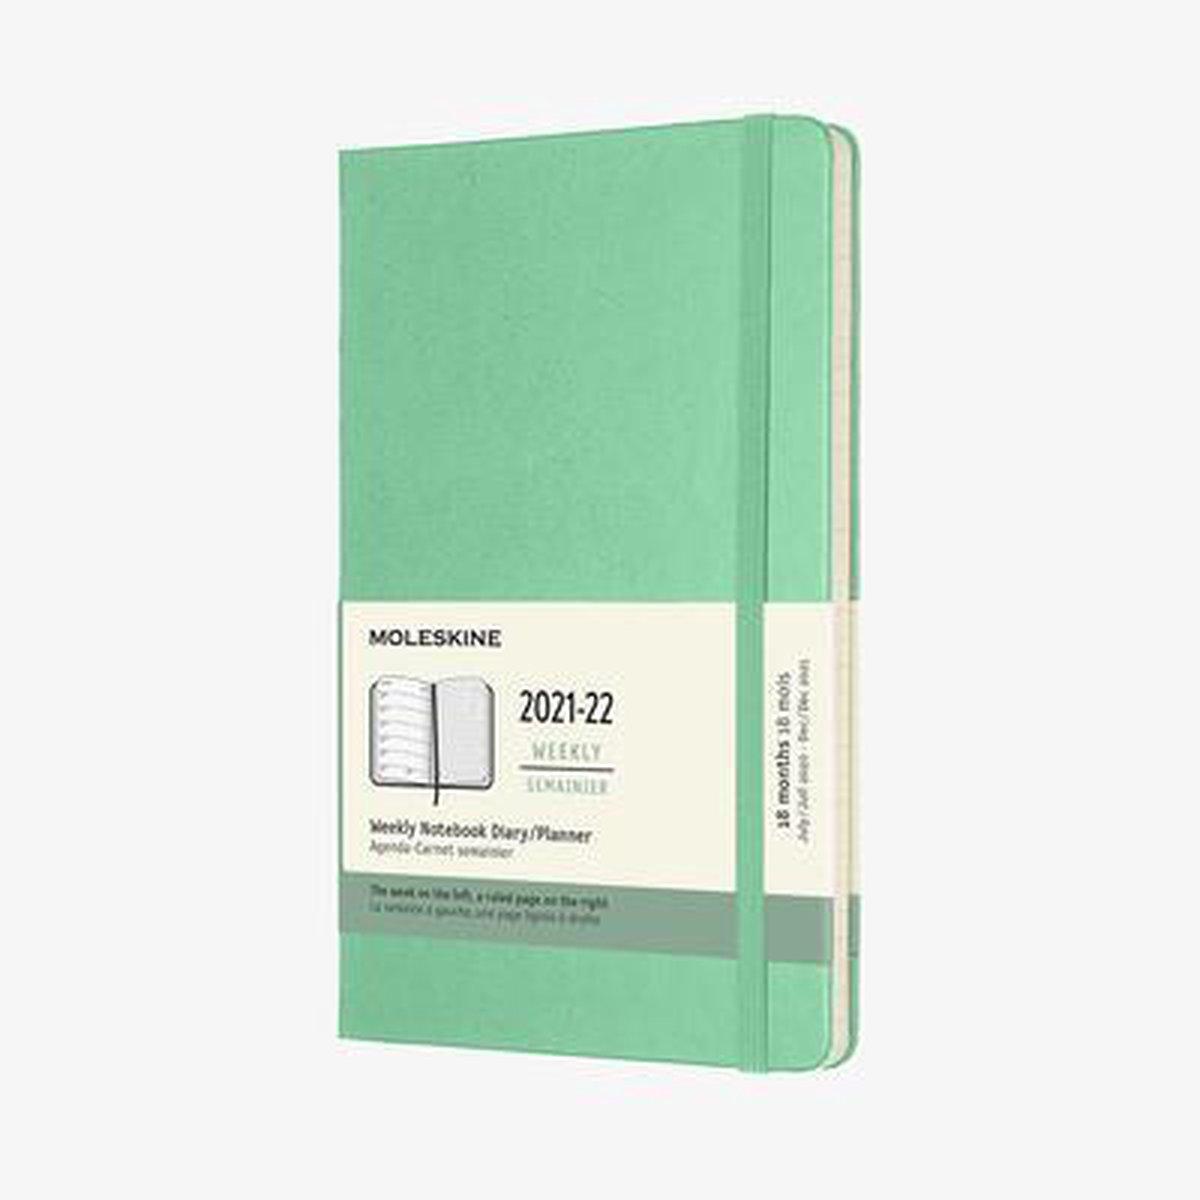 Moleskine 18 Maanden Agenda - 2021/22 - Wekelijks - Large (13x21 cm) - Ice Groen - Harde Kaft